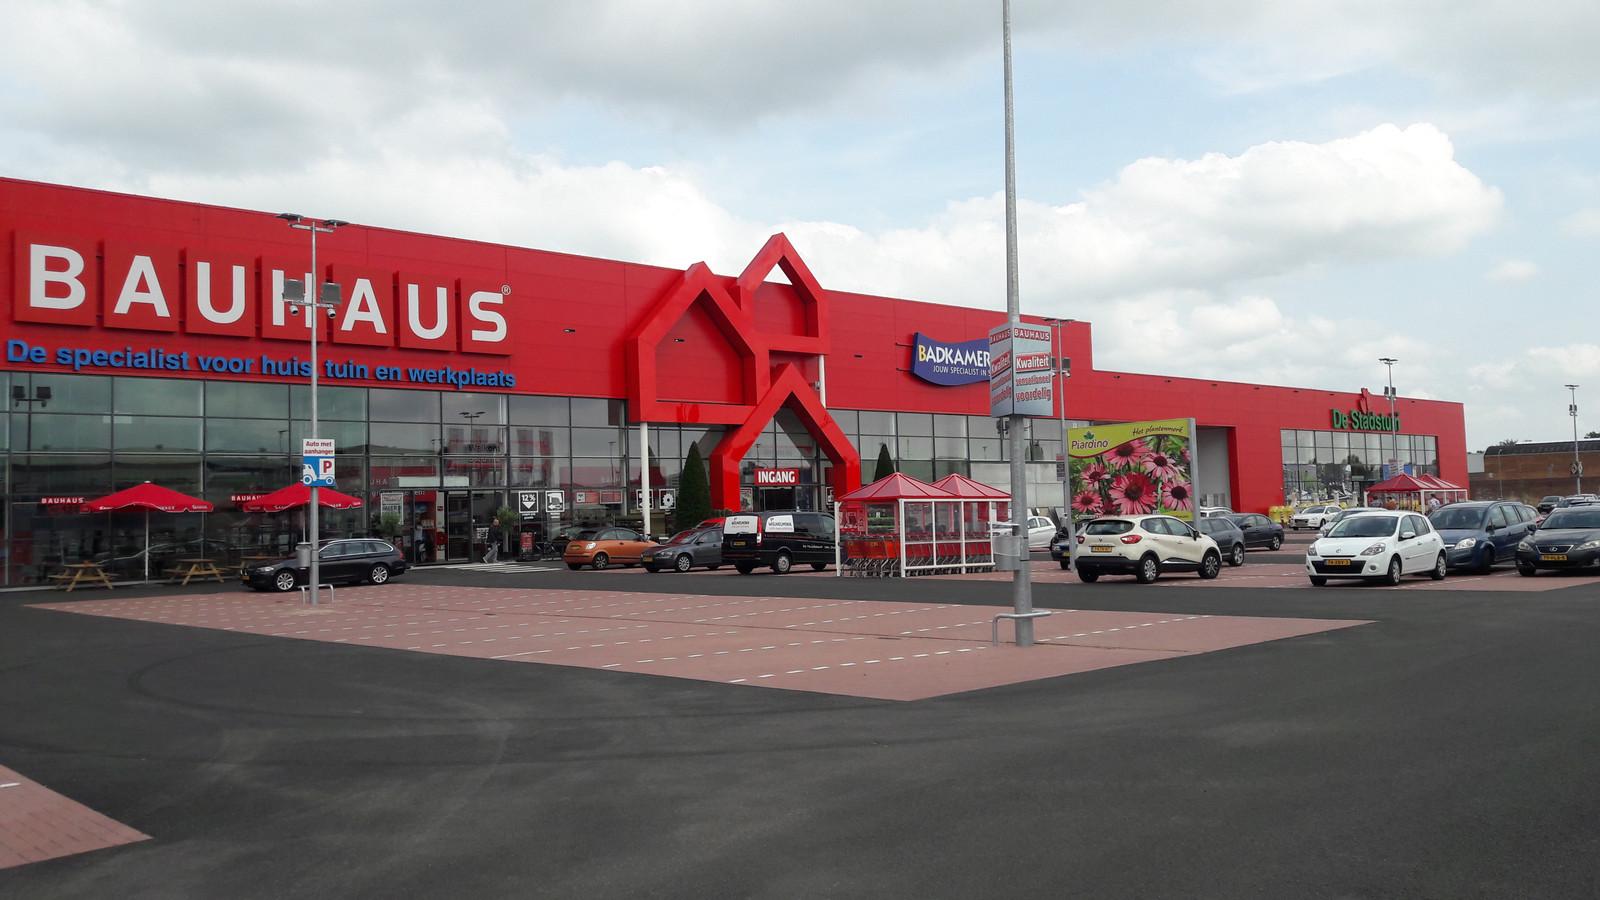 Bauhaus in Venlo.